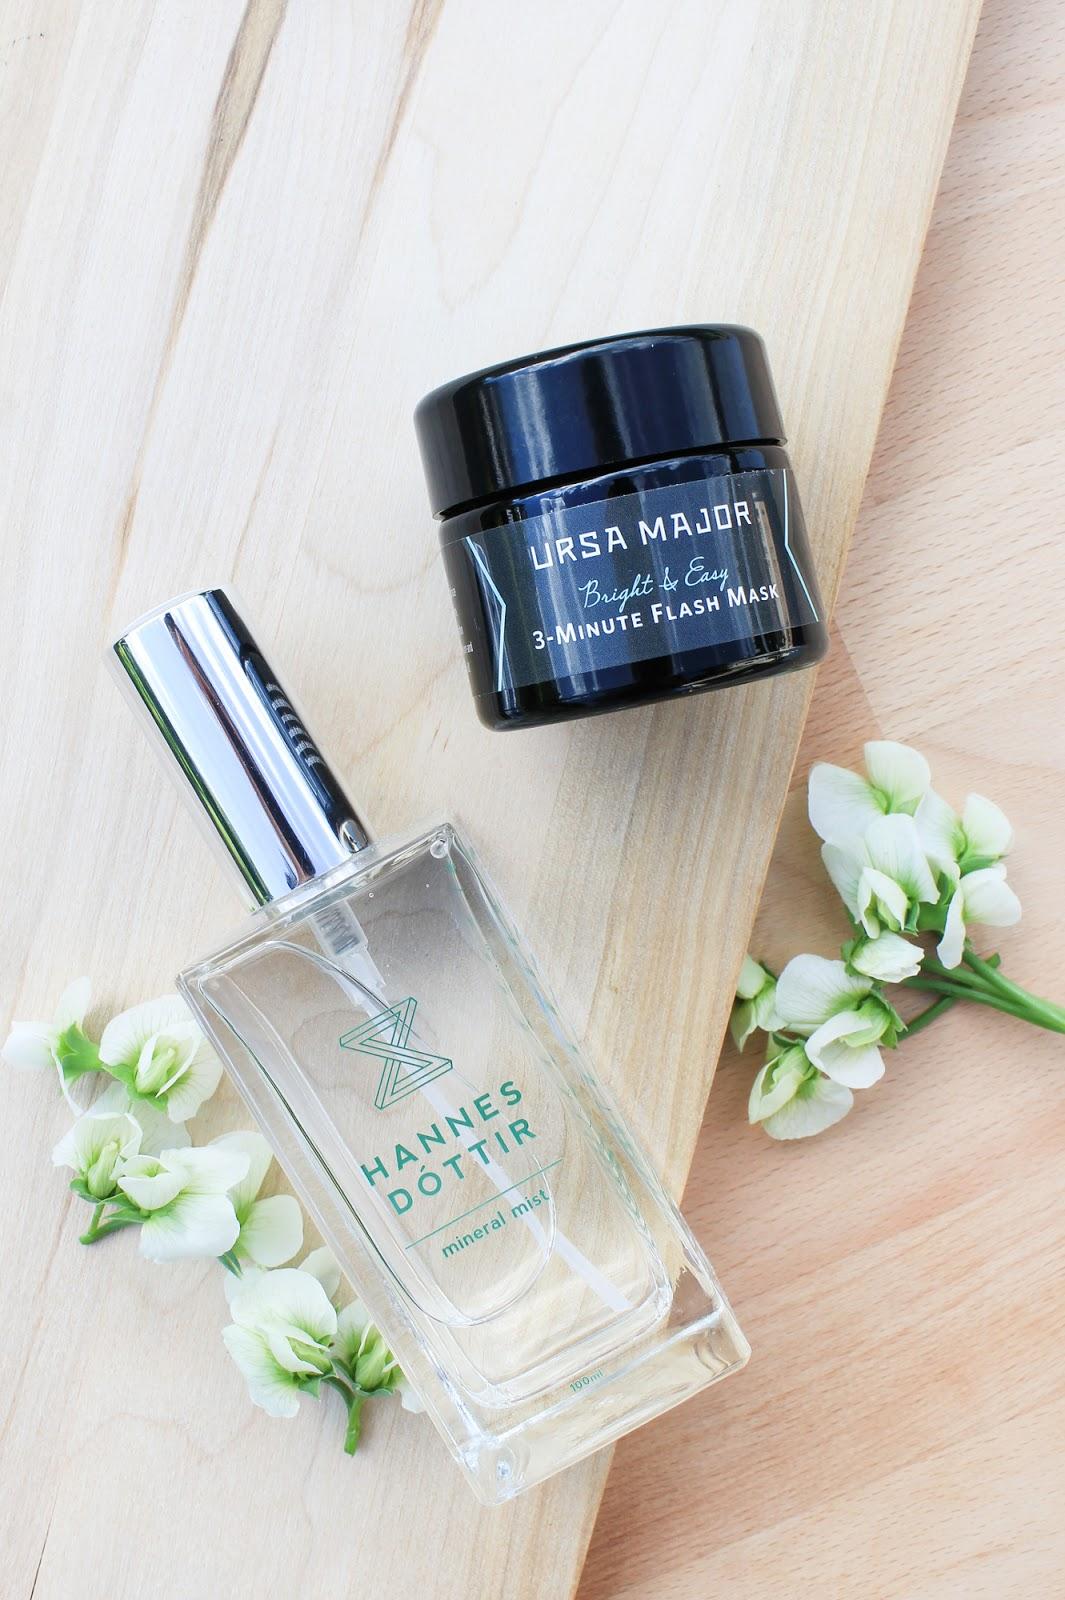 June 2018 Art Of Organics Clean Beauty Box LAGOON. Hannes Dottir Mineral Mist and Ursa Major 3-Minute Flash Mask